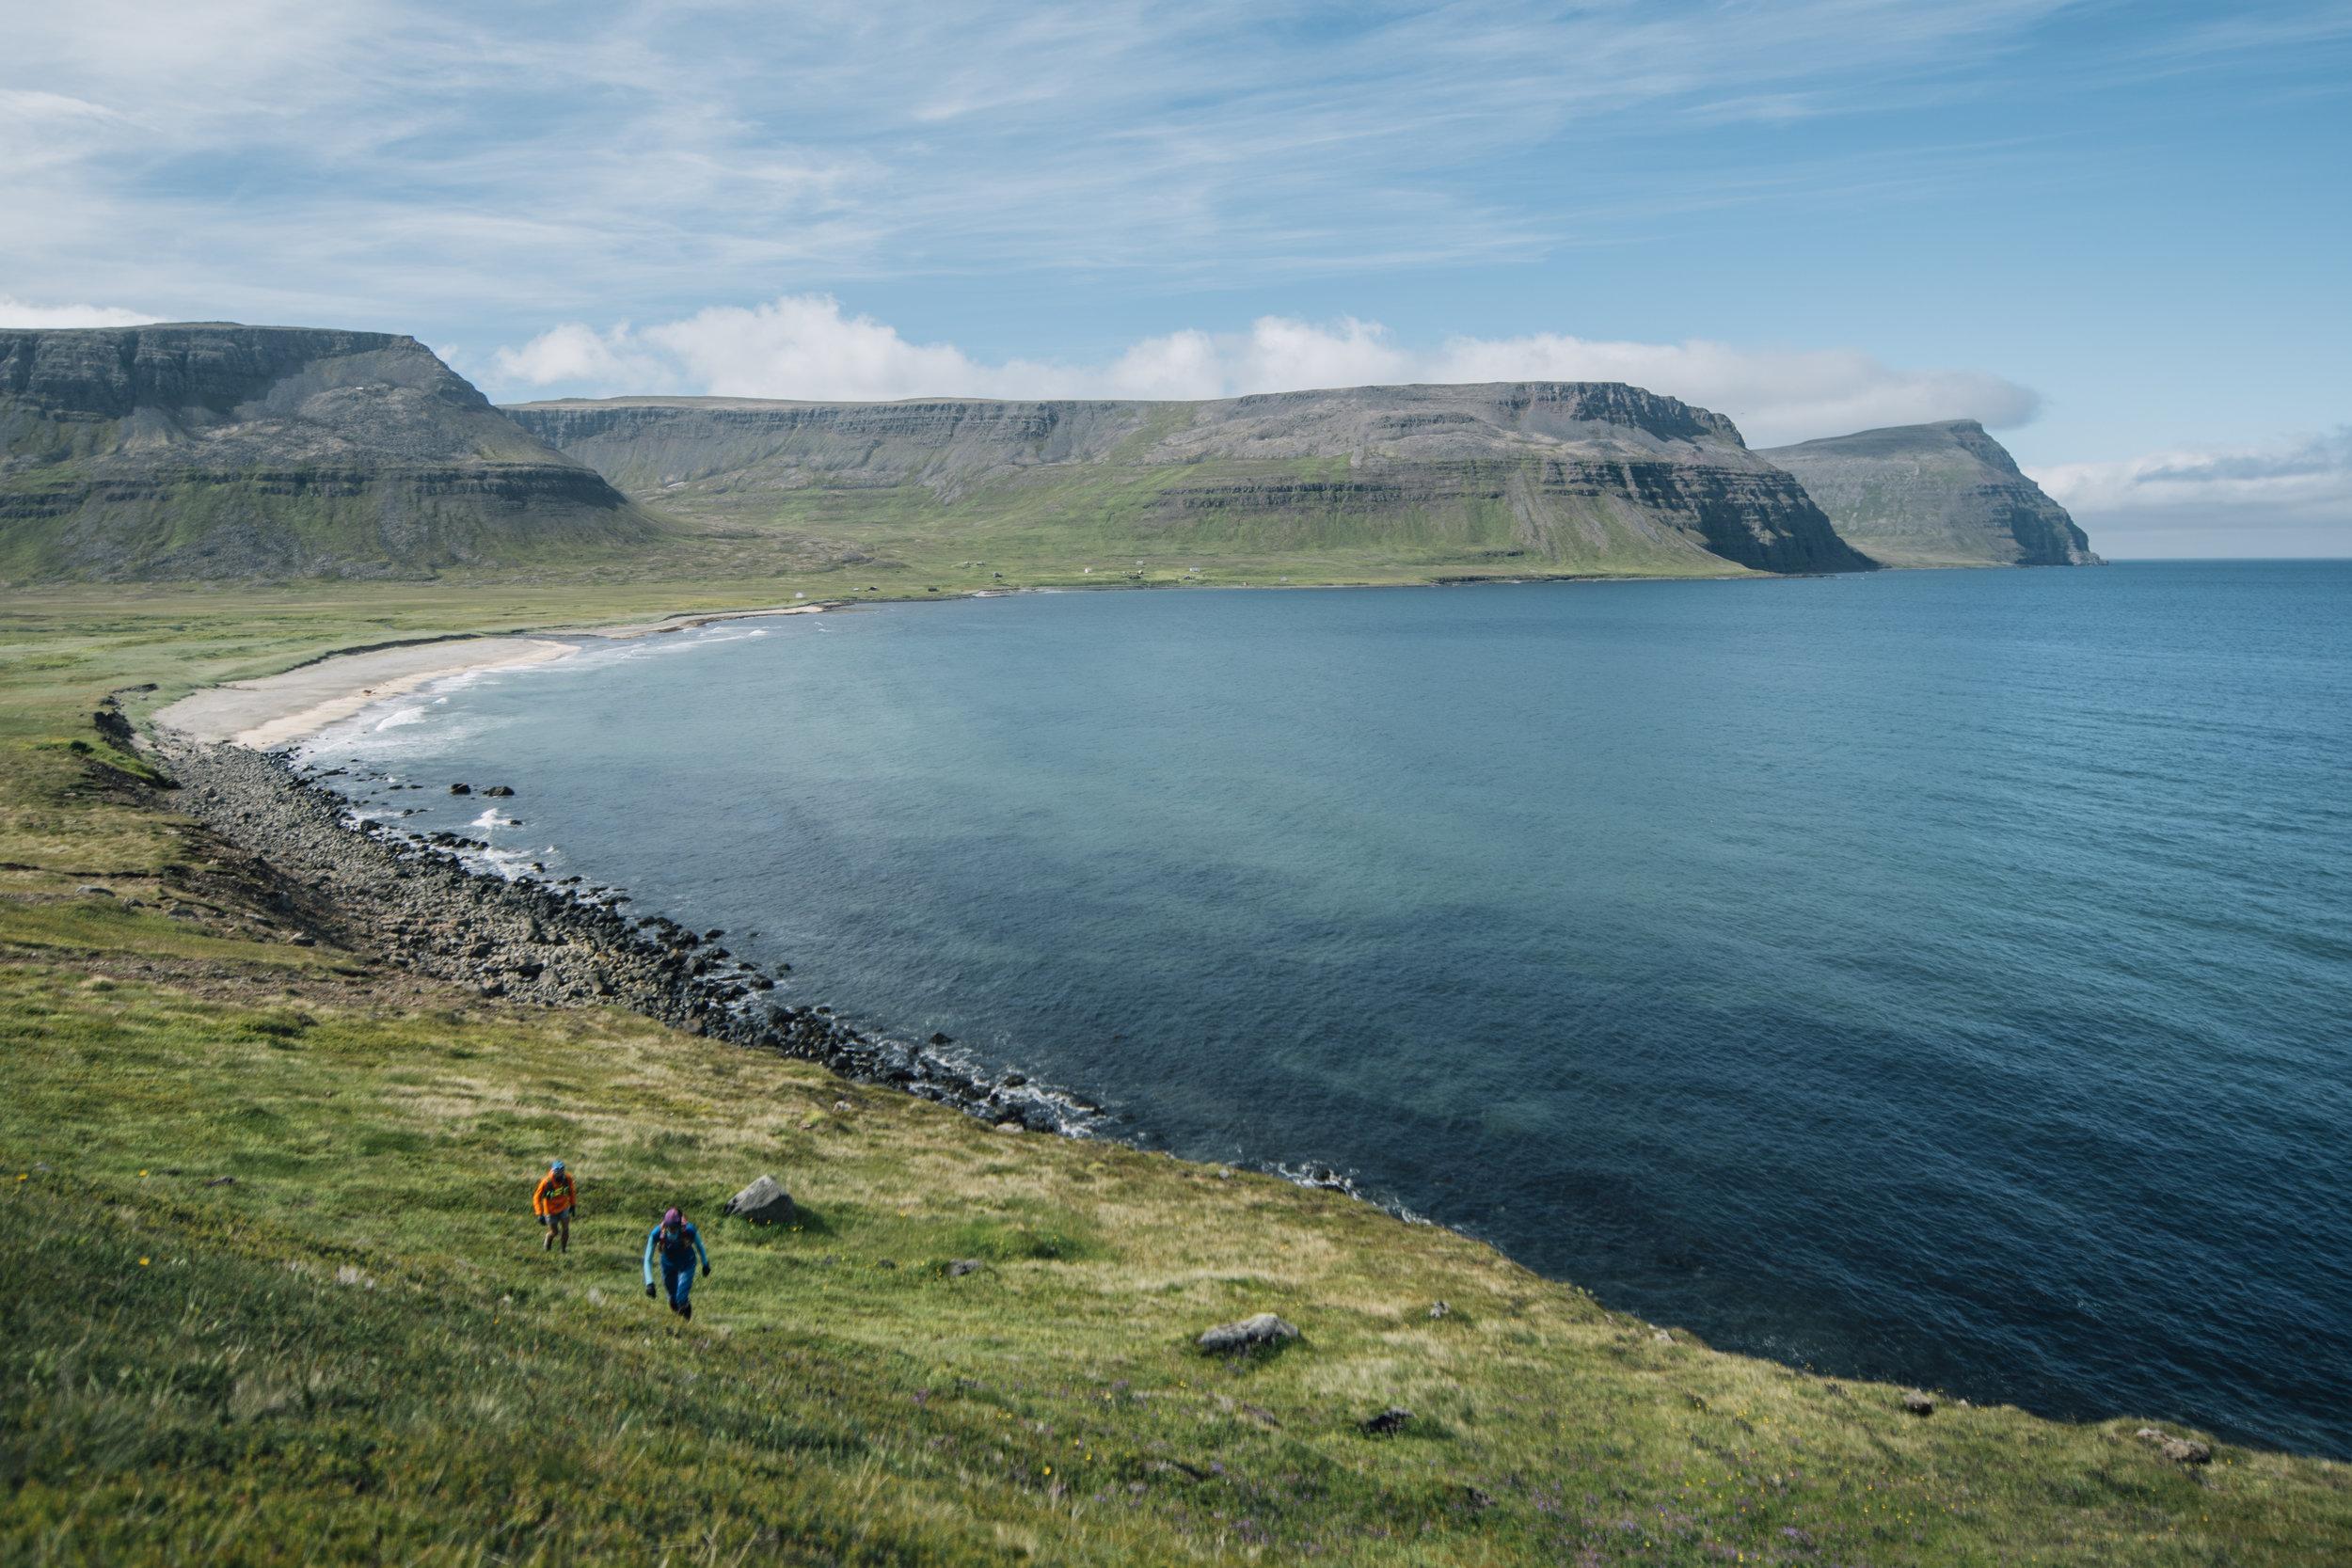 KT_160712_ThuleTrails_Iceland_6319.jpg